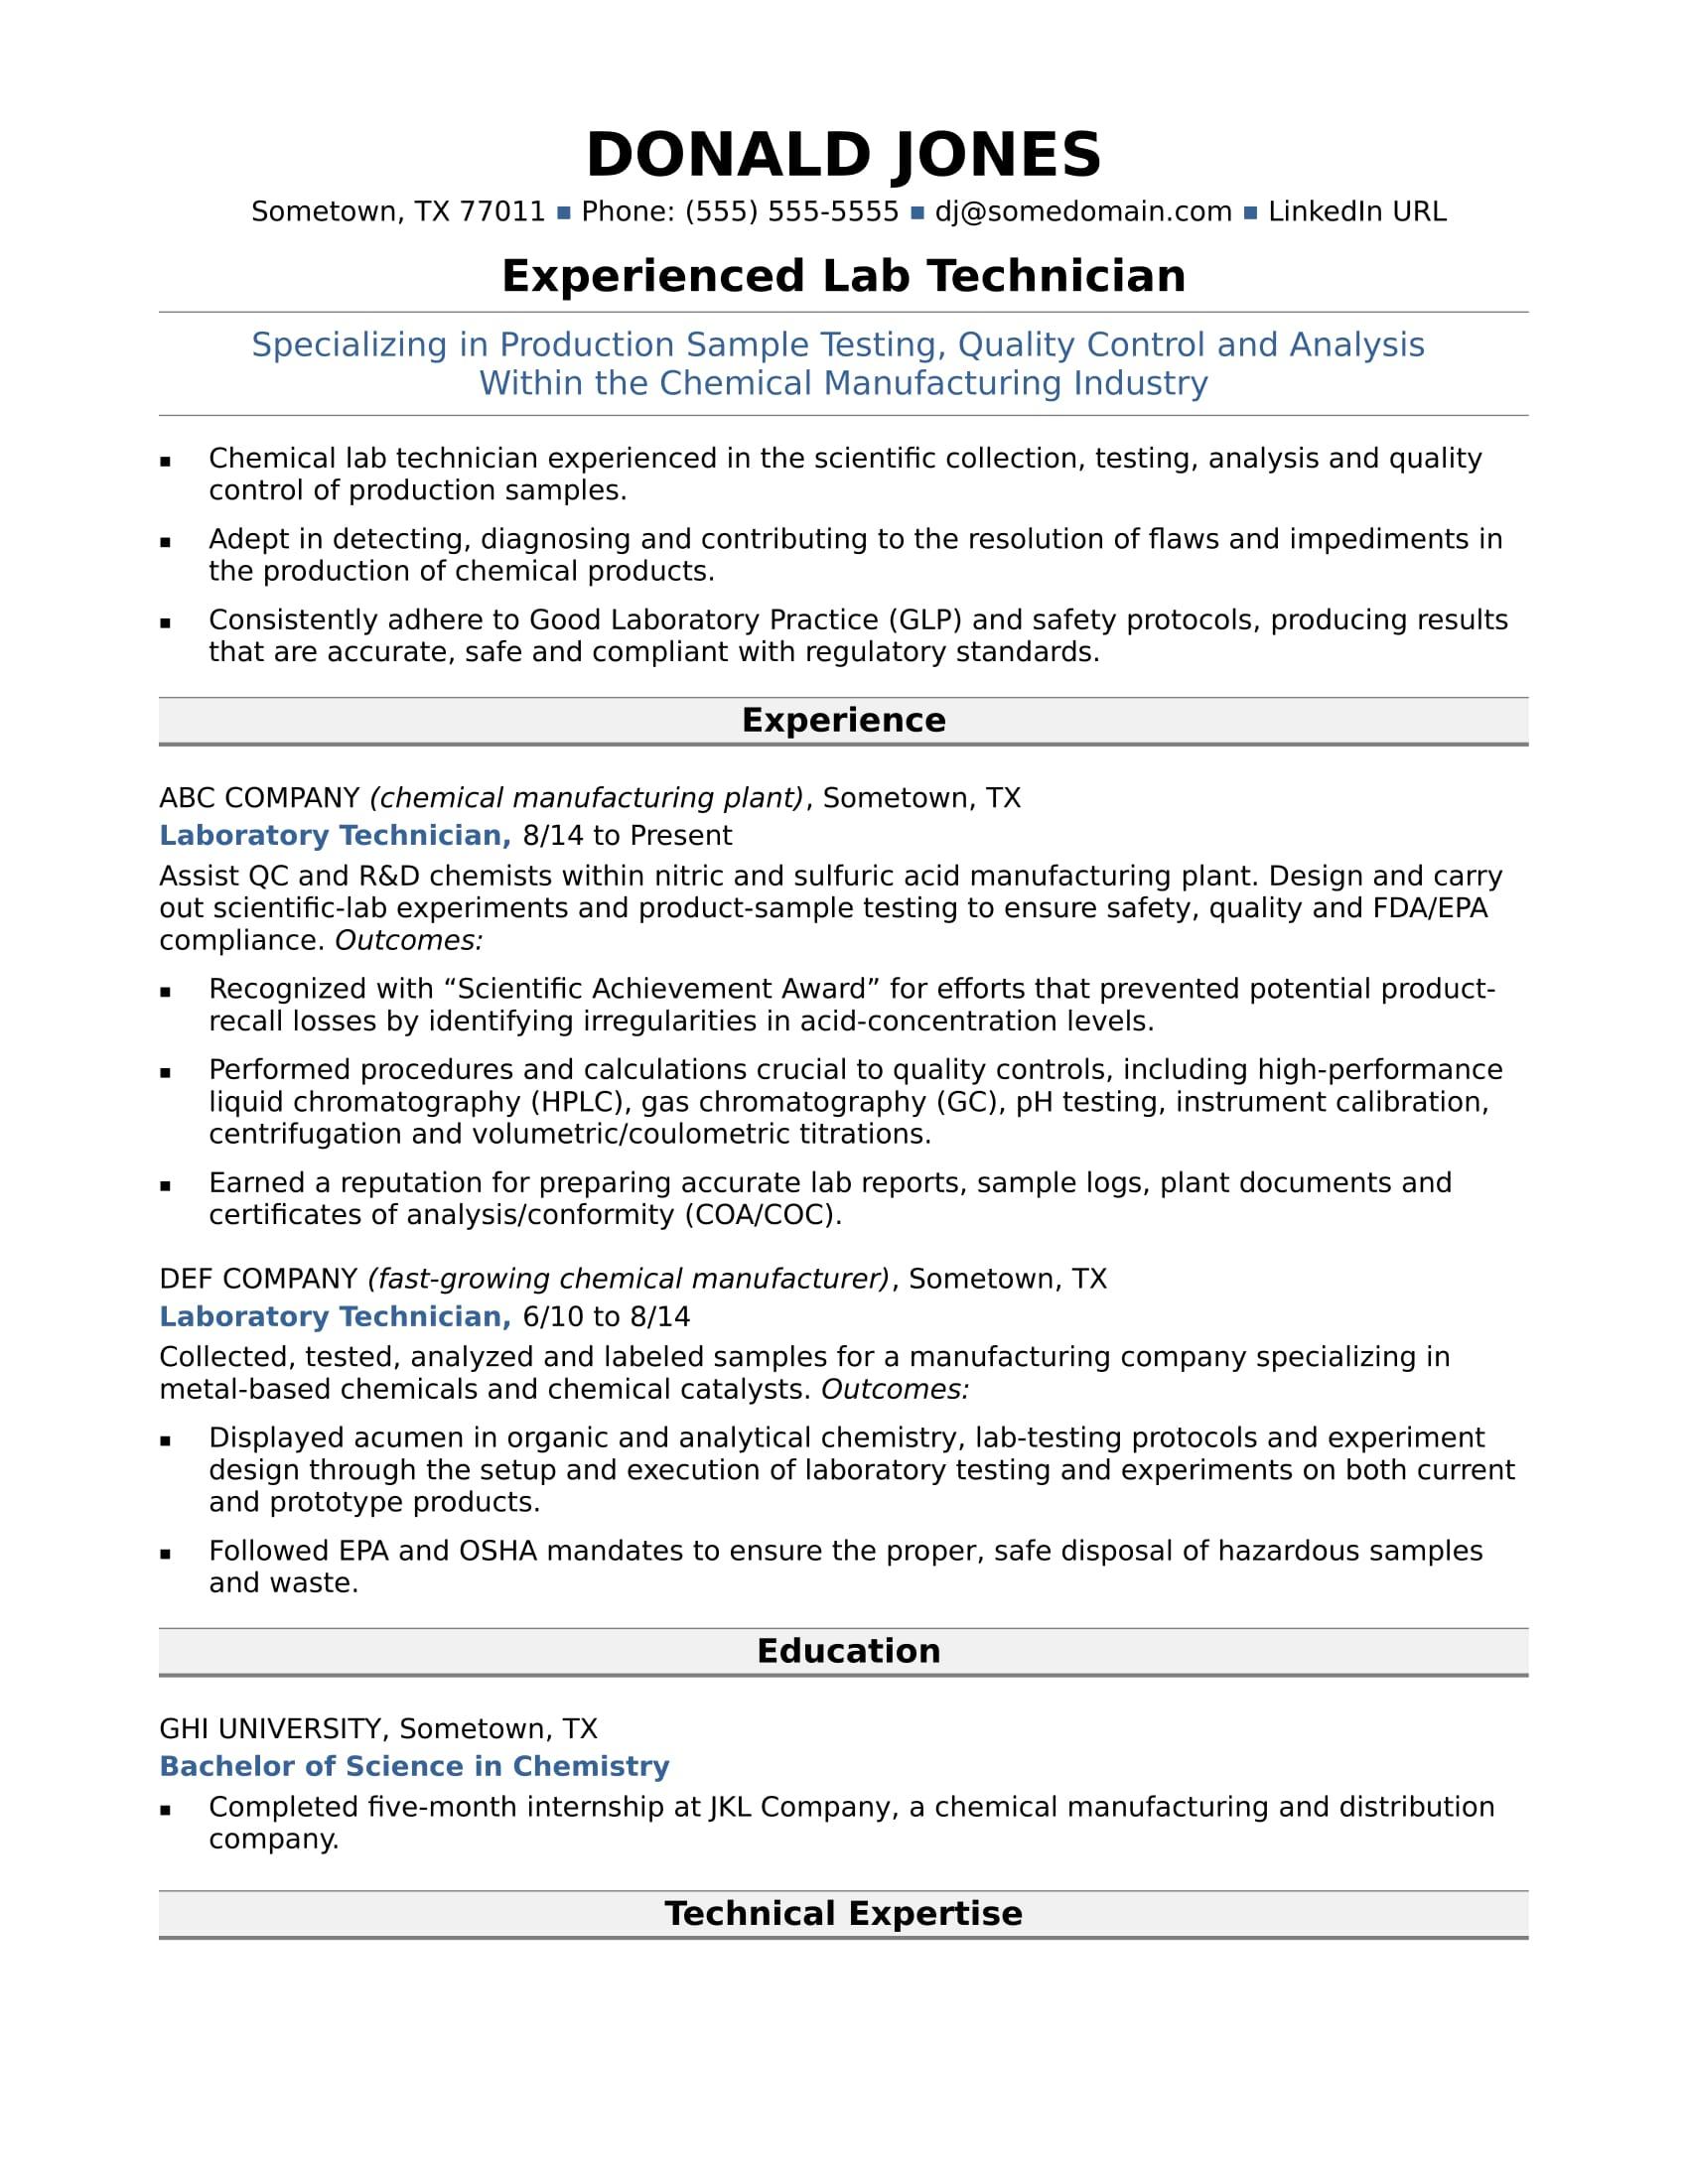 Midlevel Lab Technician Resume Sample  Monstercom